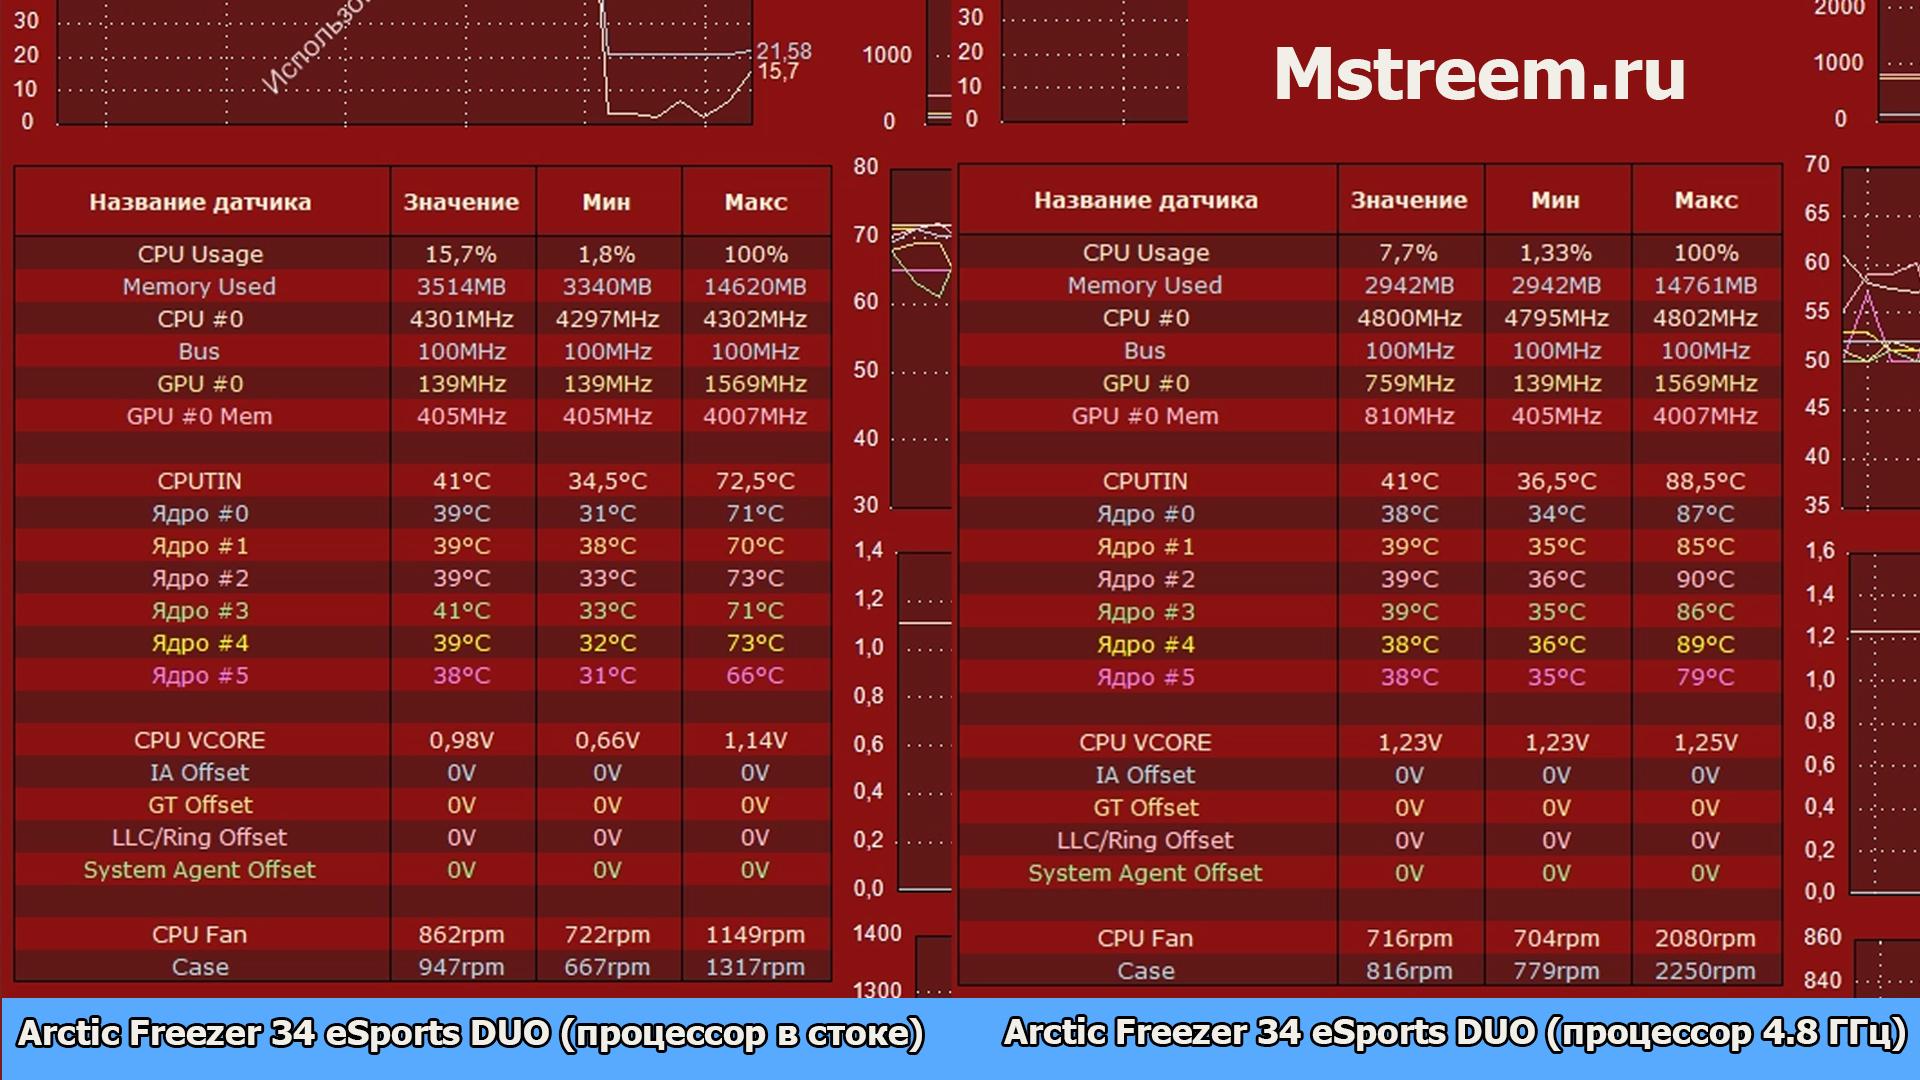 Тесты и обзор кулера Arctic Freezer 34 eSports DUO